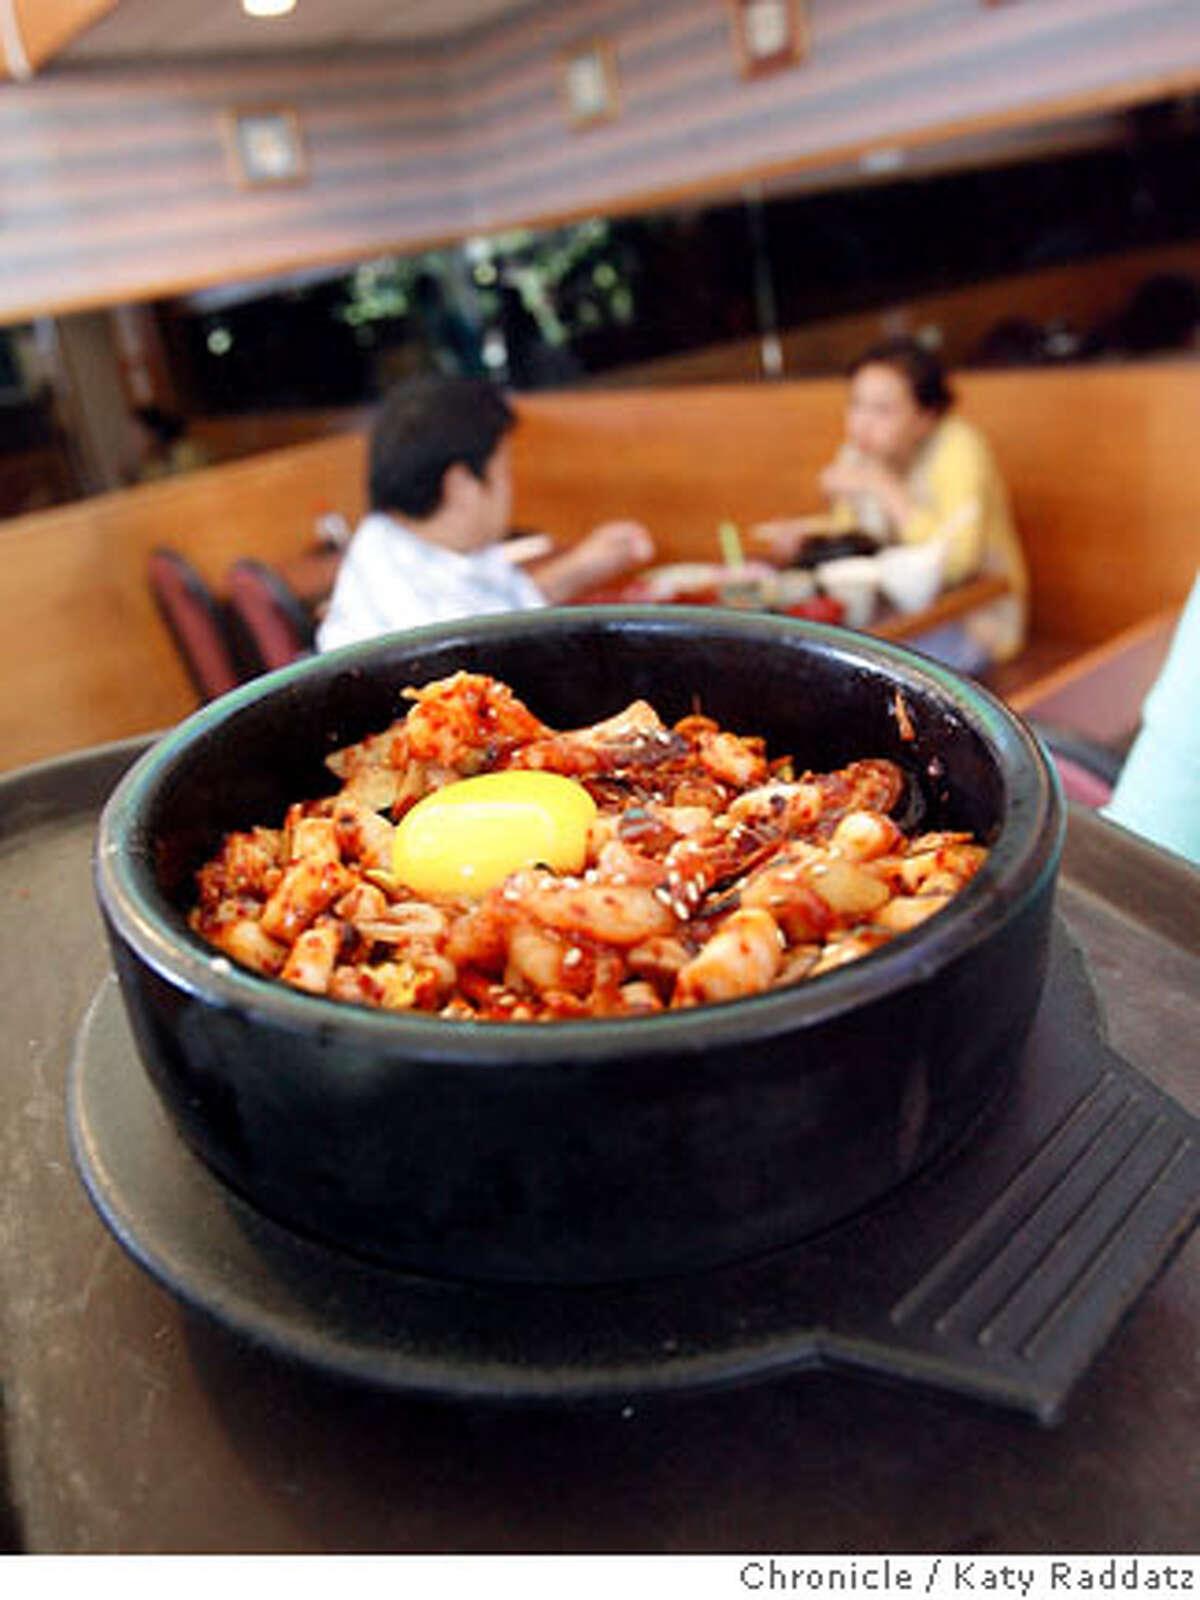 BARGAIN11 Seafood Bi Bim Bop at Arang Restaurant at 1506 Fillmore St. in San Francisco, CA., which serves Japanese and Korean food. KATY RADDATZ / The Chronicle Photo taken on 10/2/07, in San Francisco, CA, USA